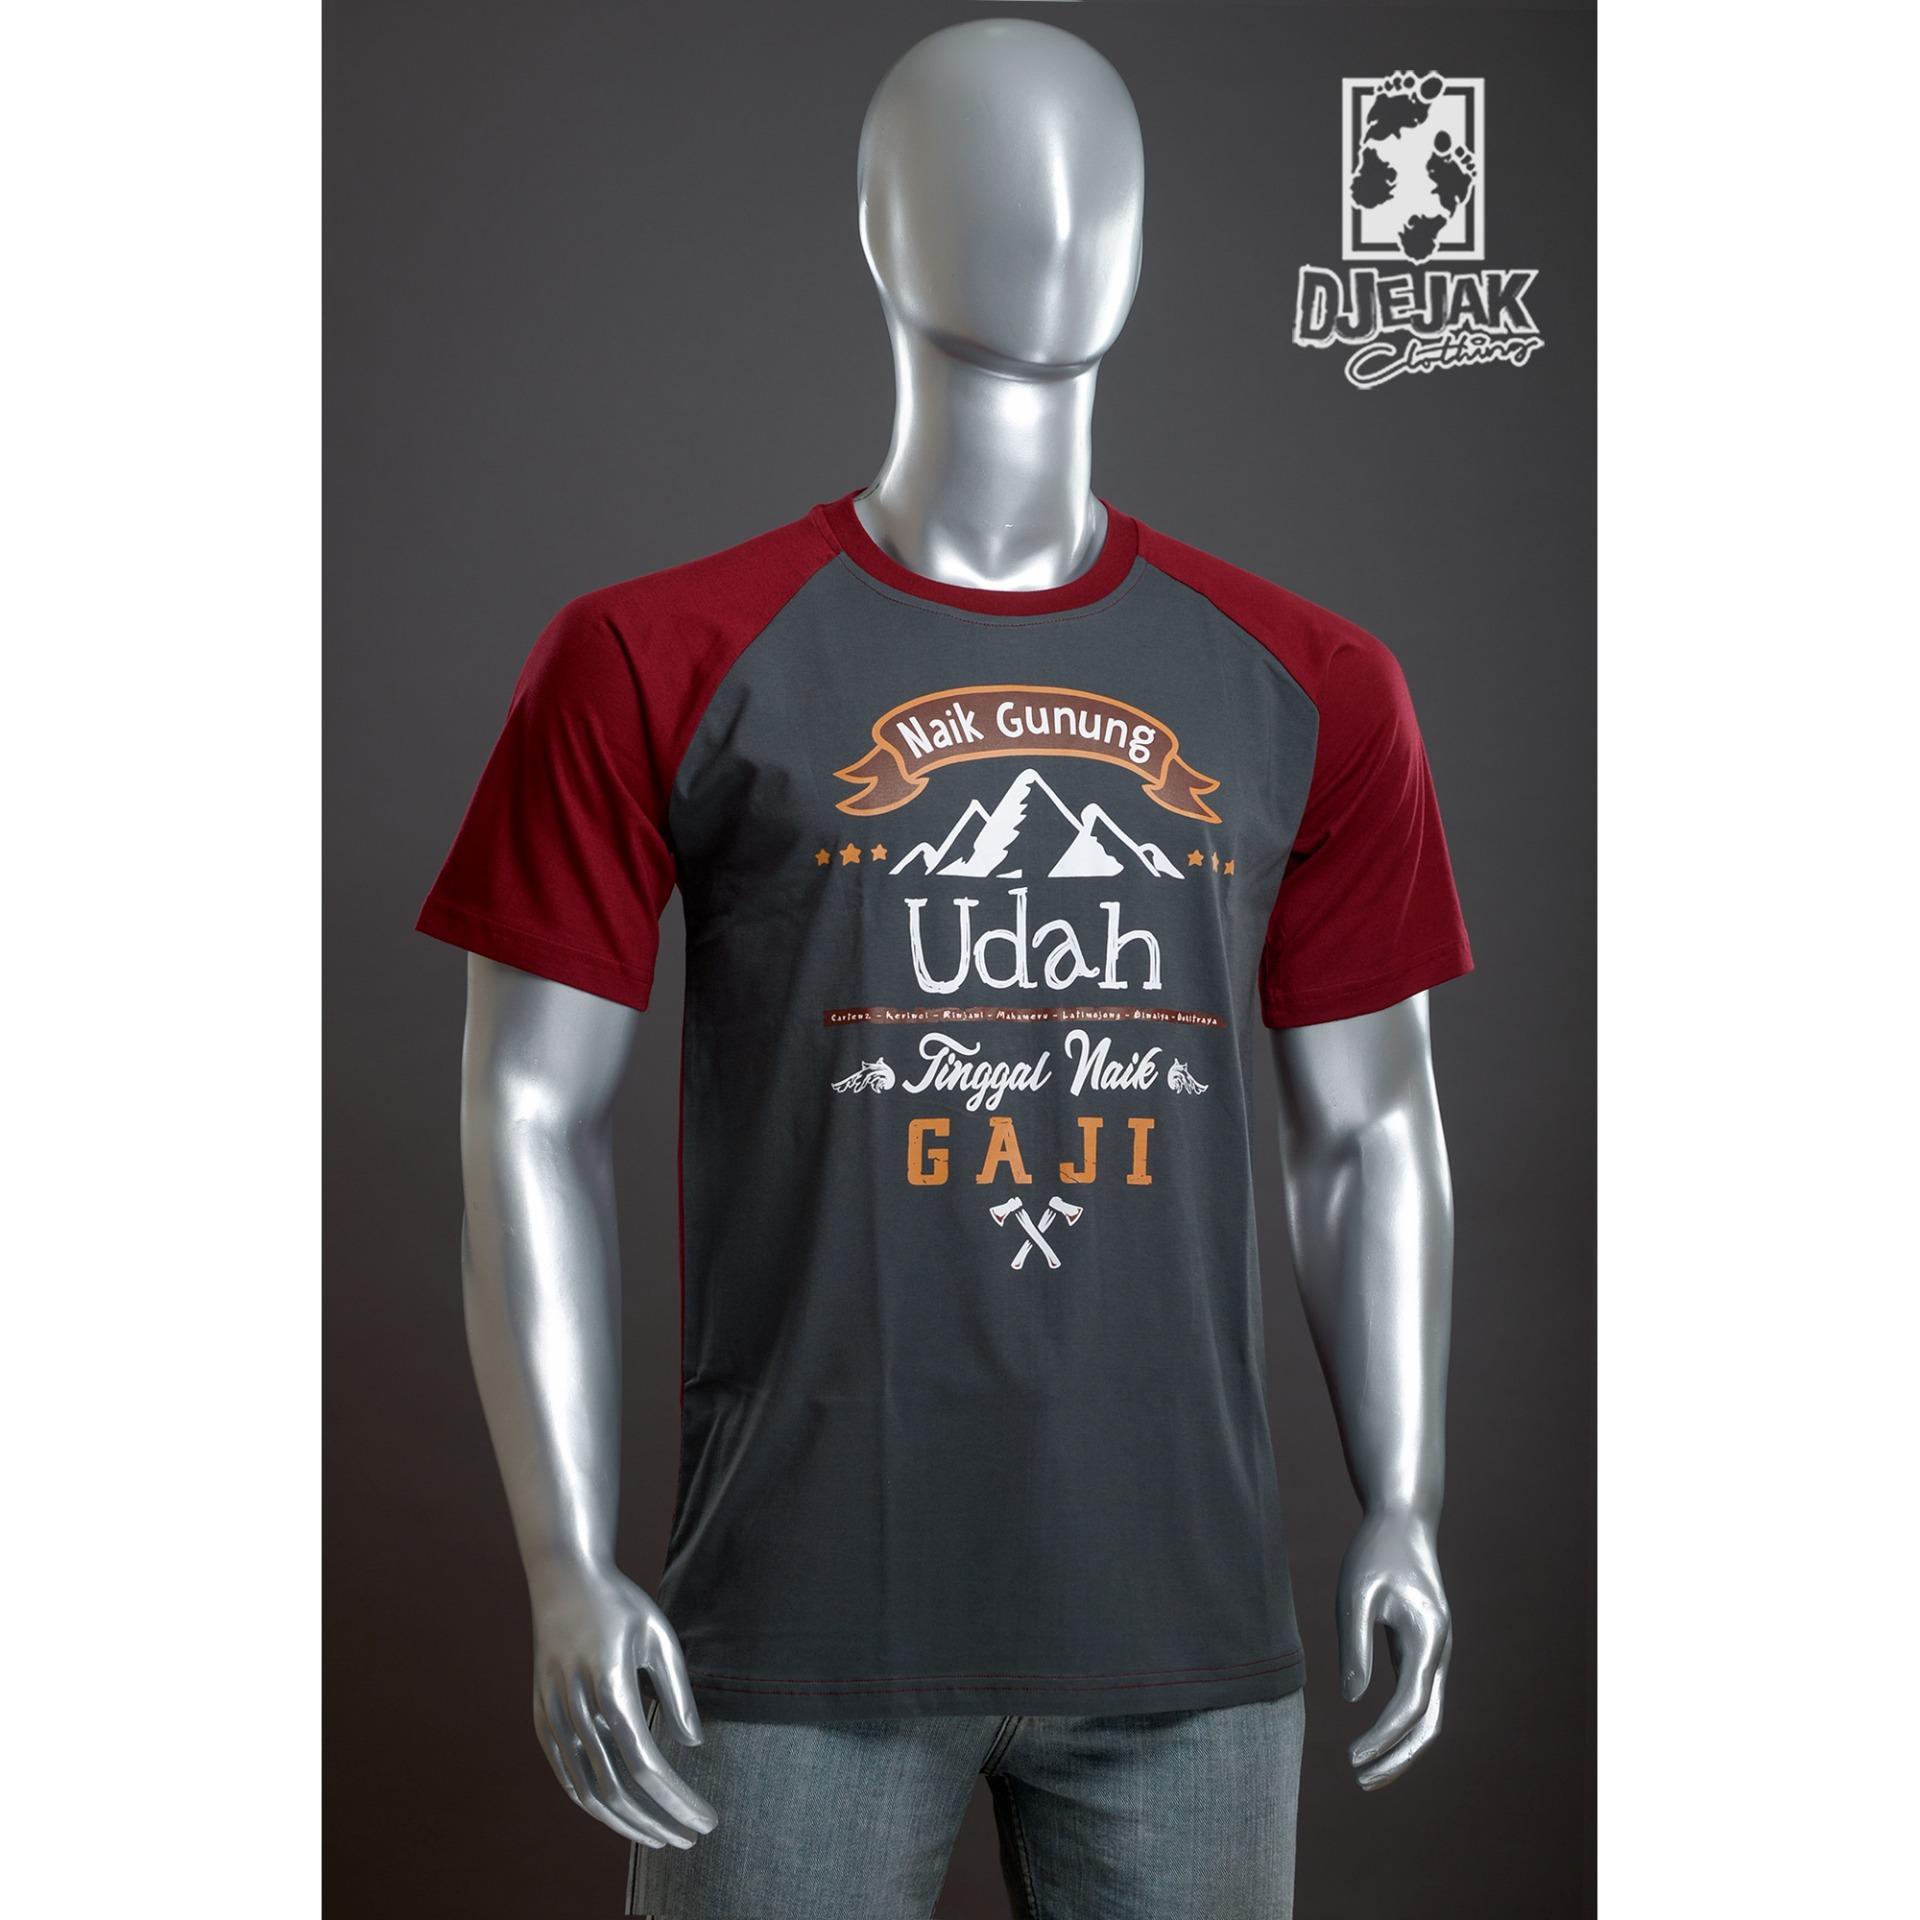 Jual Djejak Clothing Tshirt Kaos Adventure Unisex Lengan Pendek Naik Gaji Jawa Timur